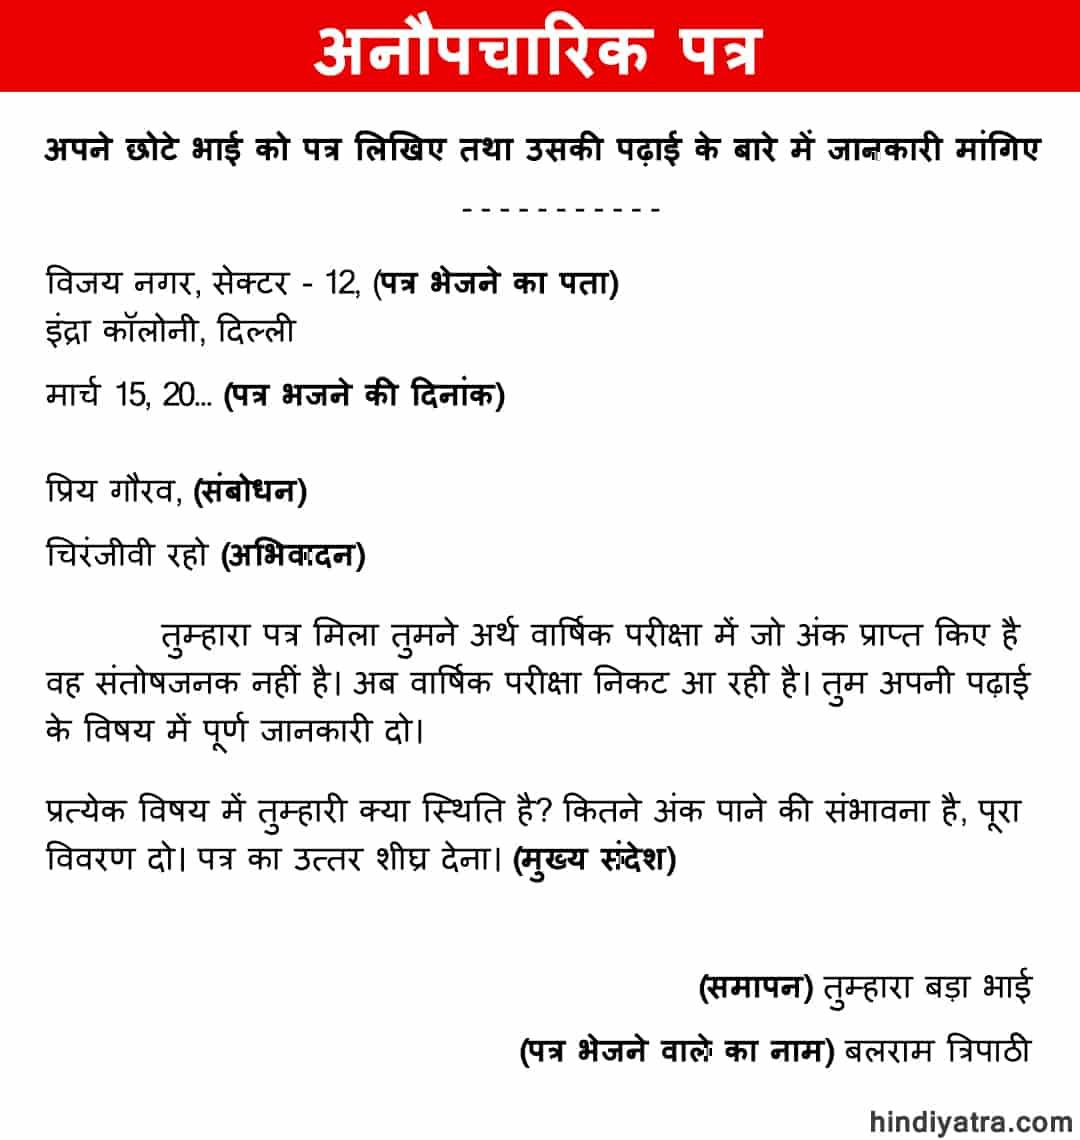 Anopcharik Patra in Hindi